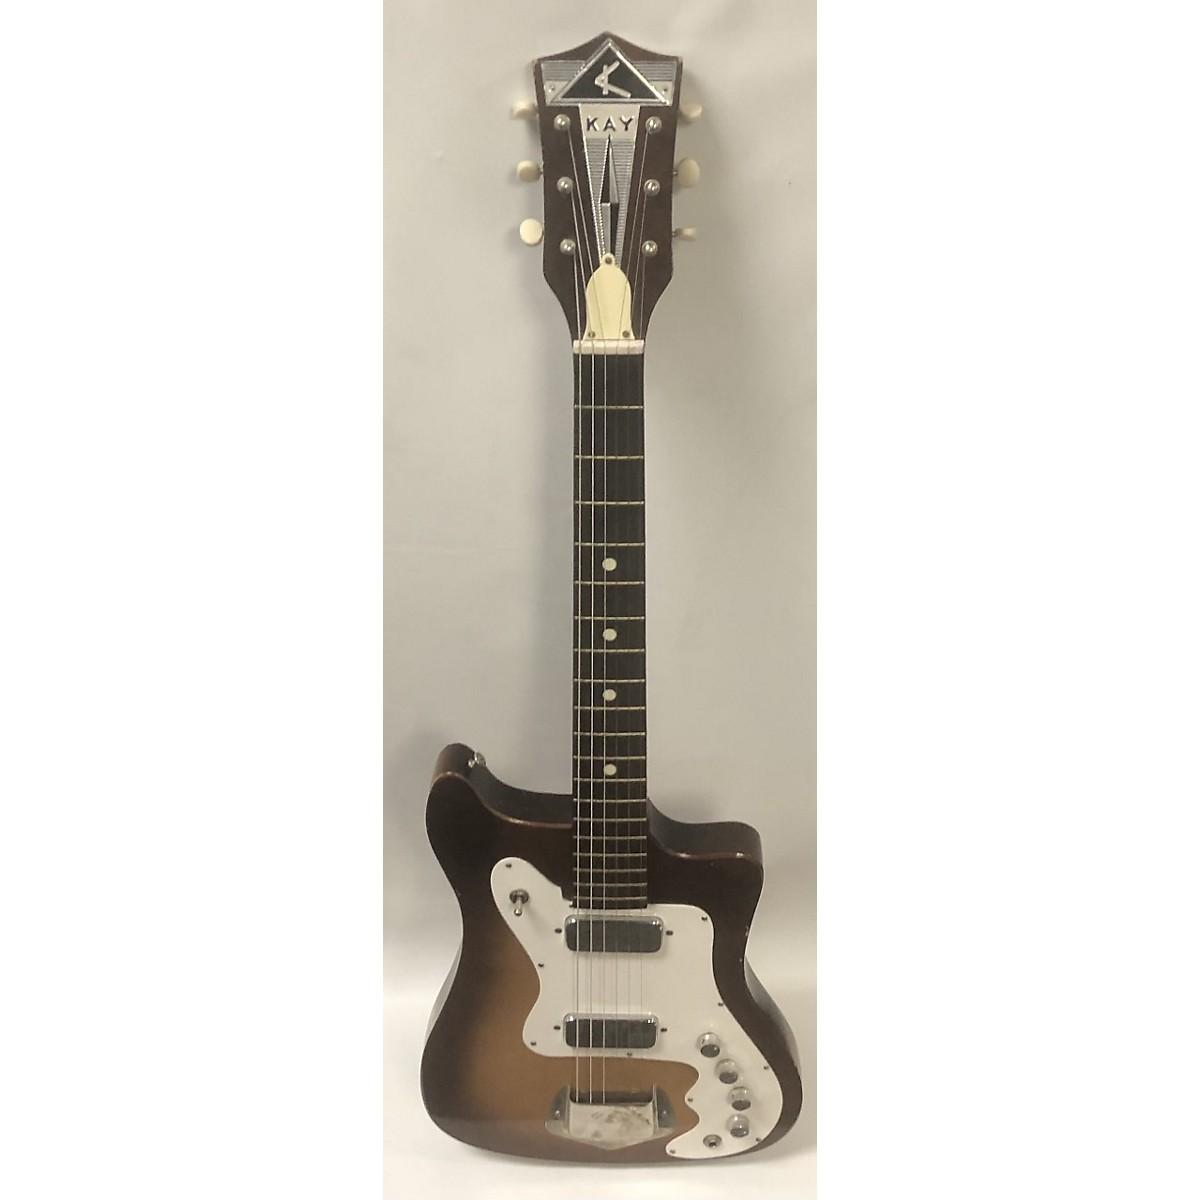 Kay 1960s K102 Vanguard Solid Body Electric Guitar